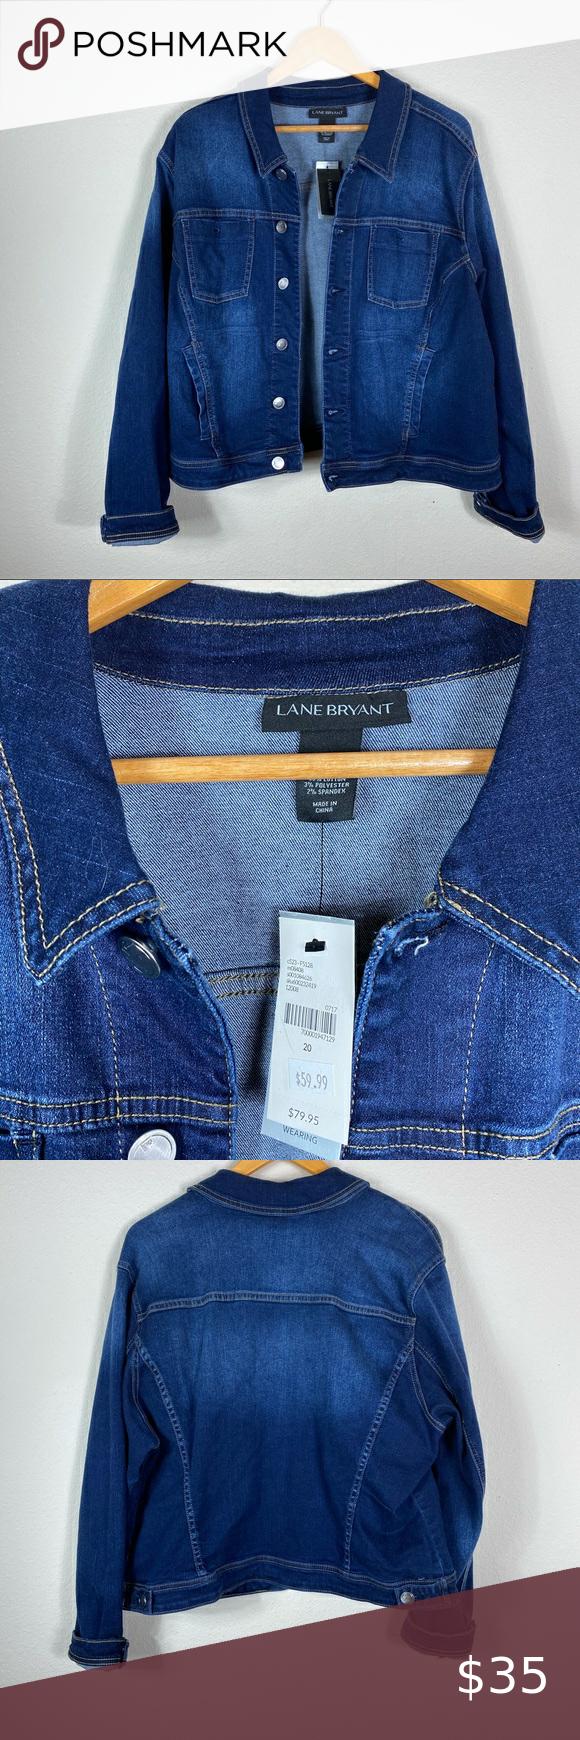 Lane Bryant Jean Jacket Good Thickness Lane Bryant Jackets Coats Jean Jackets Denim Jacket Women Distressed Black Jeans Denim Women [ 1740 x 580 Pixel ]